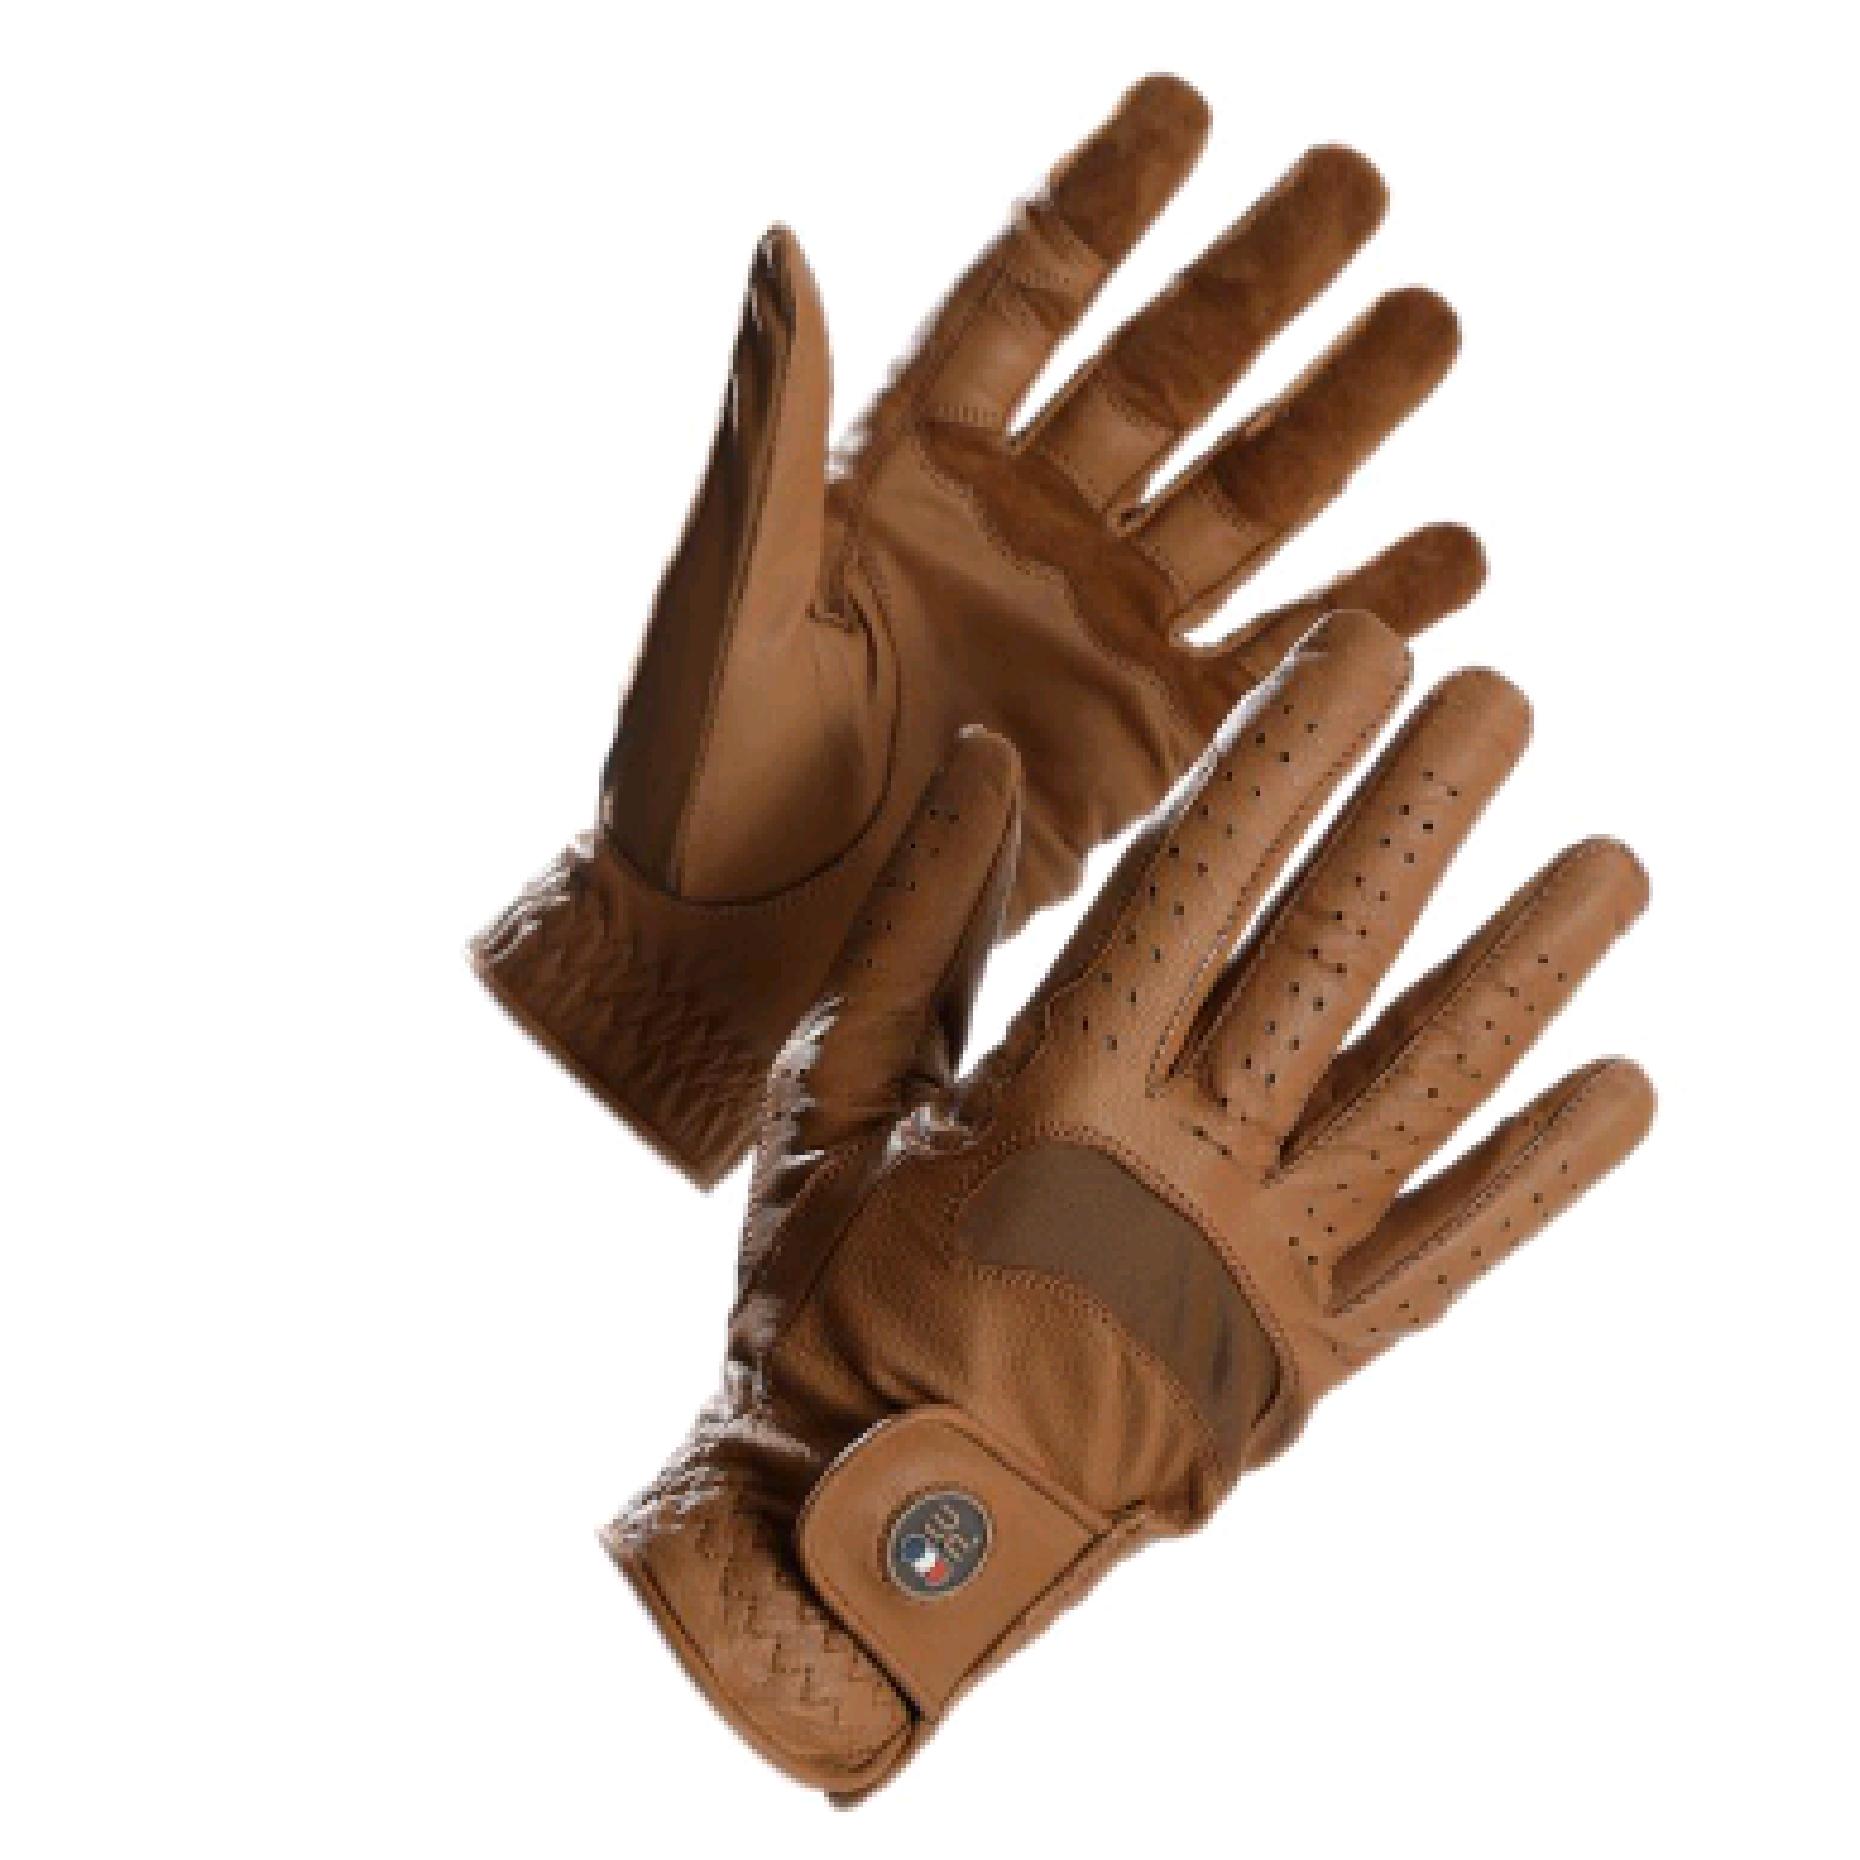 Mizar Leather Gloves